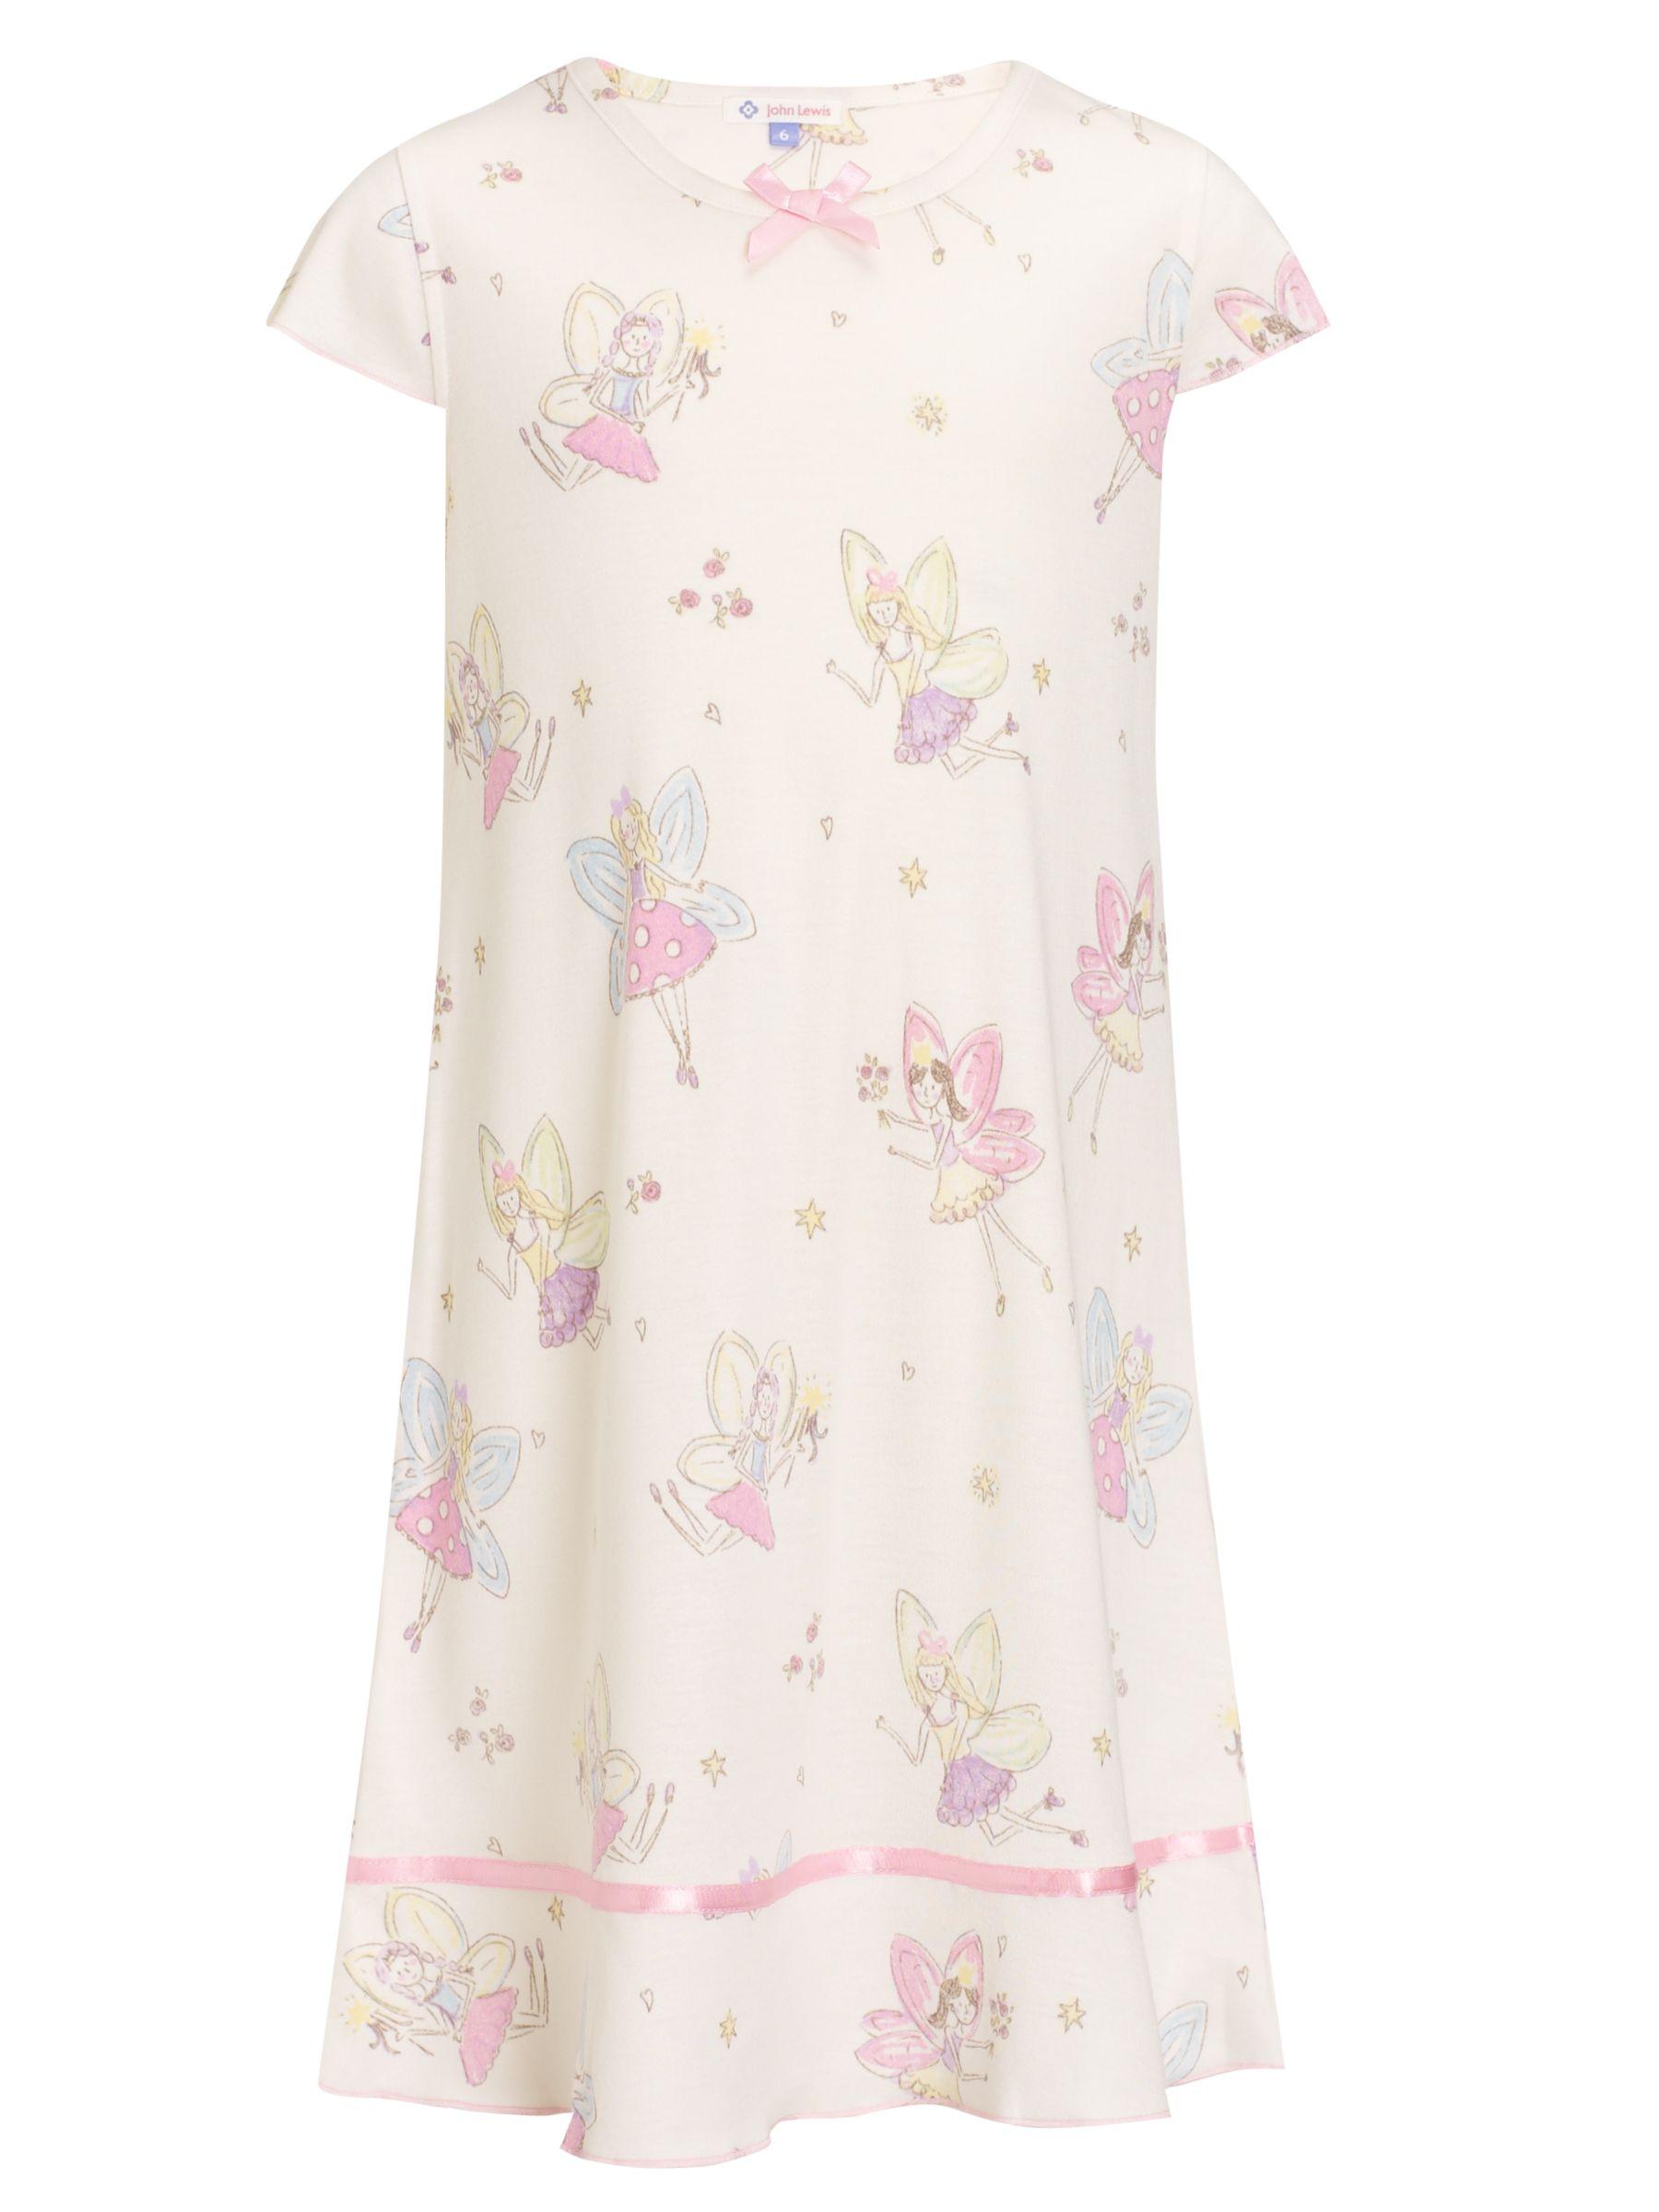 John Lewis Girl Short Sleeved Fairy Nightie, Cream